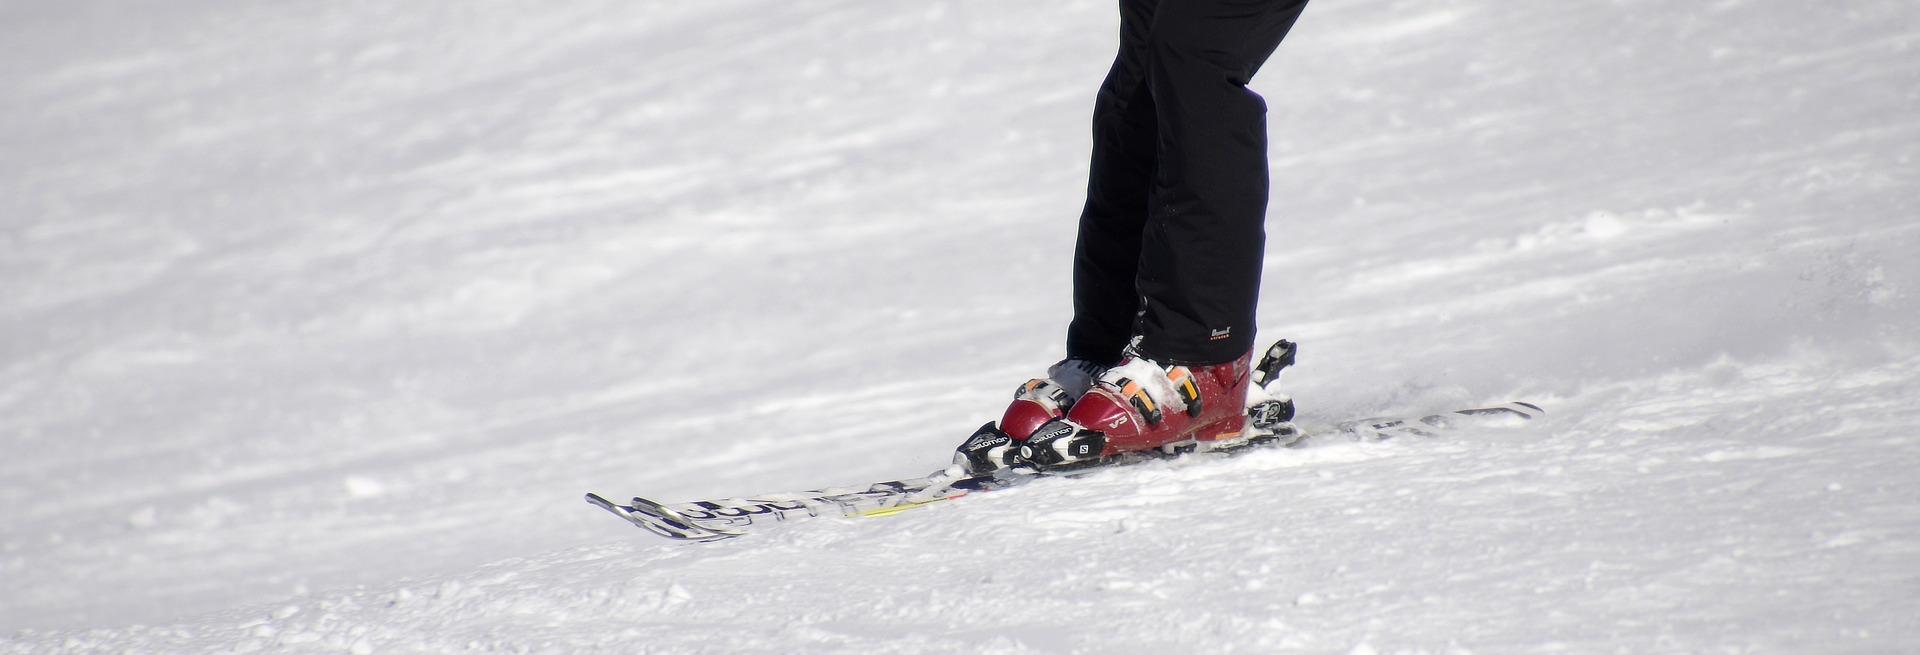 Wintersport studenten